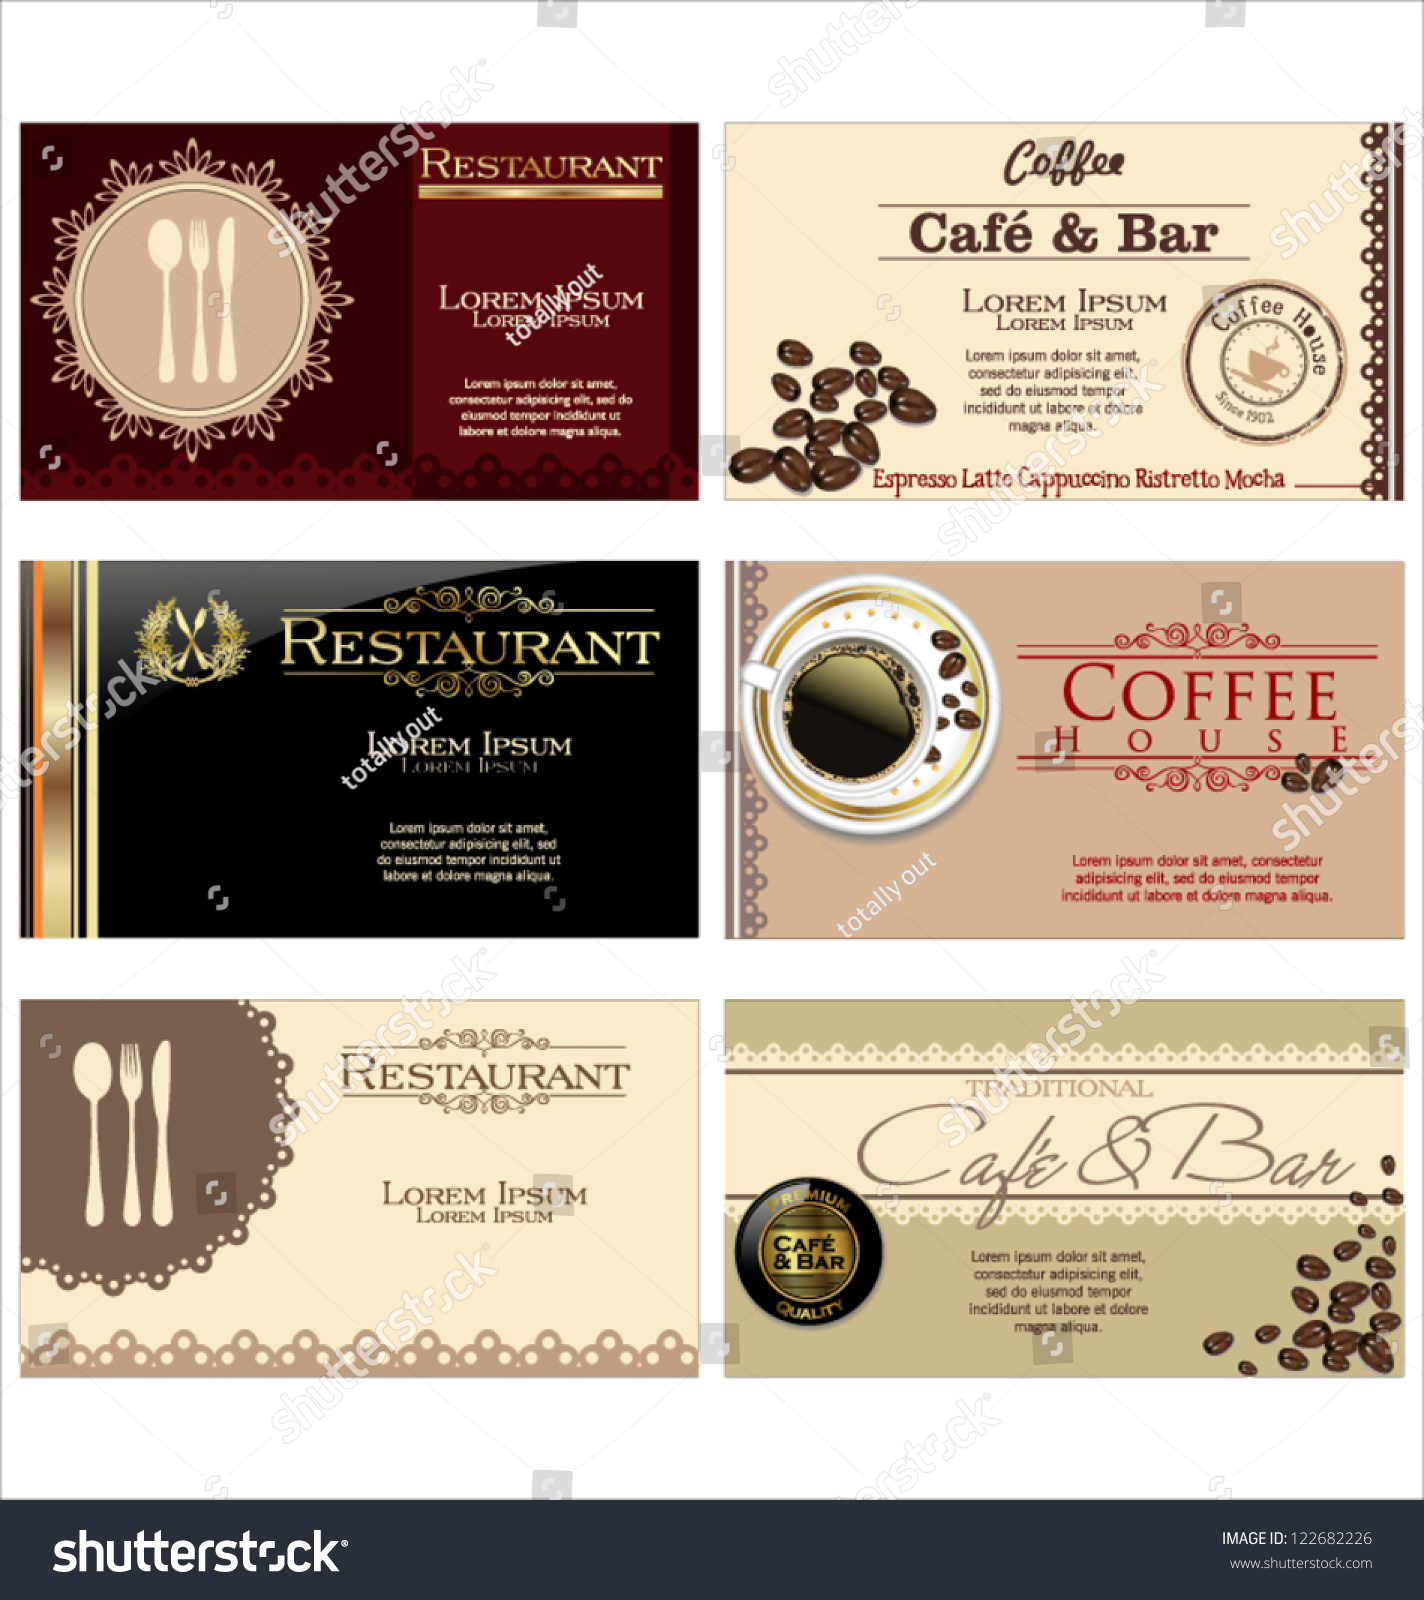 business cards cafe restaurant stock vector shutterstock